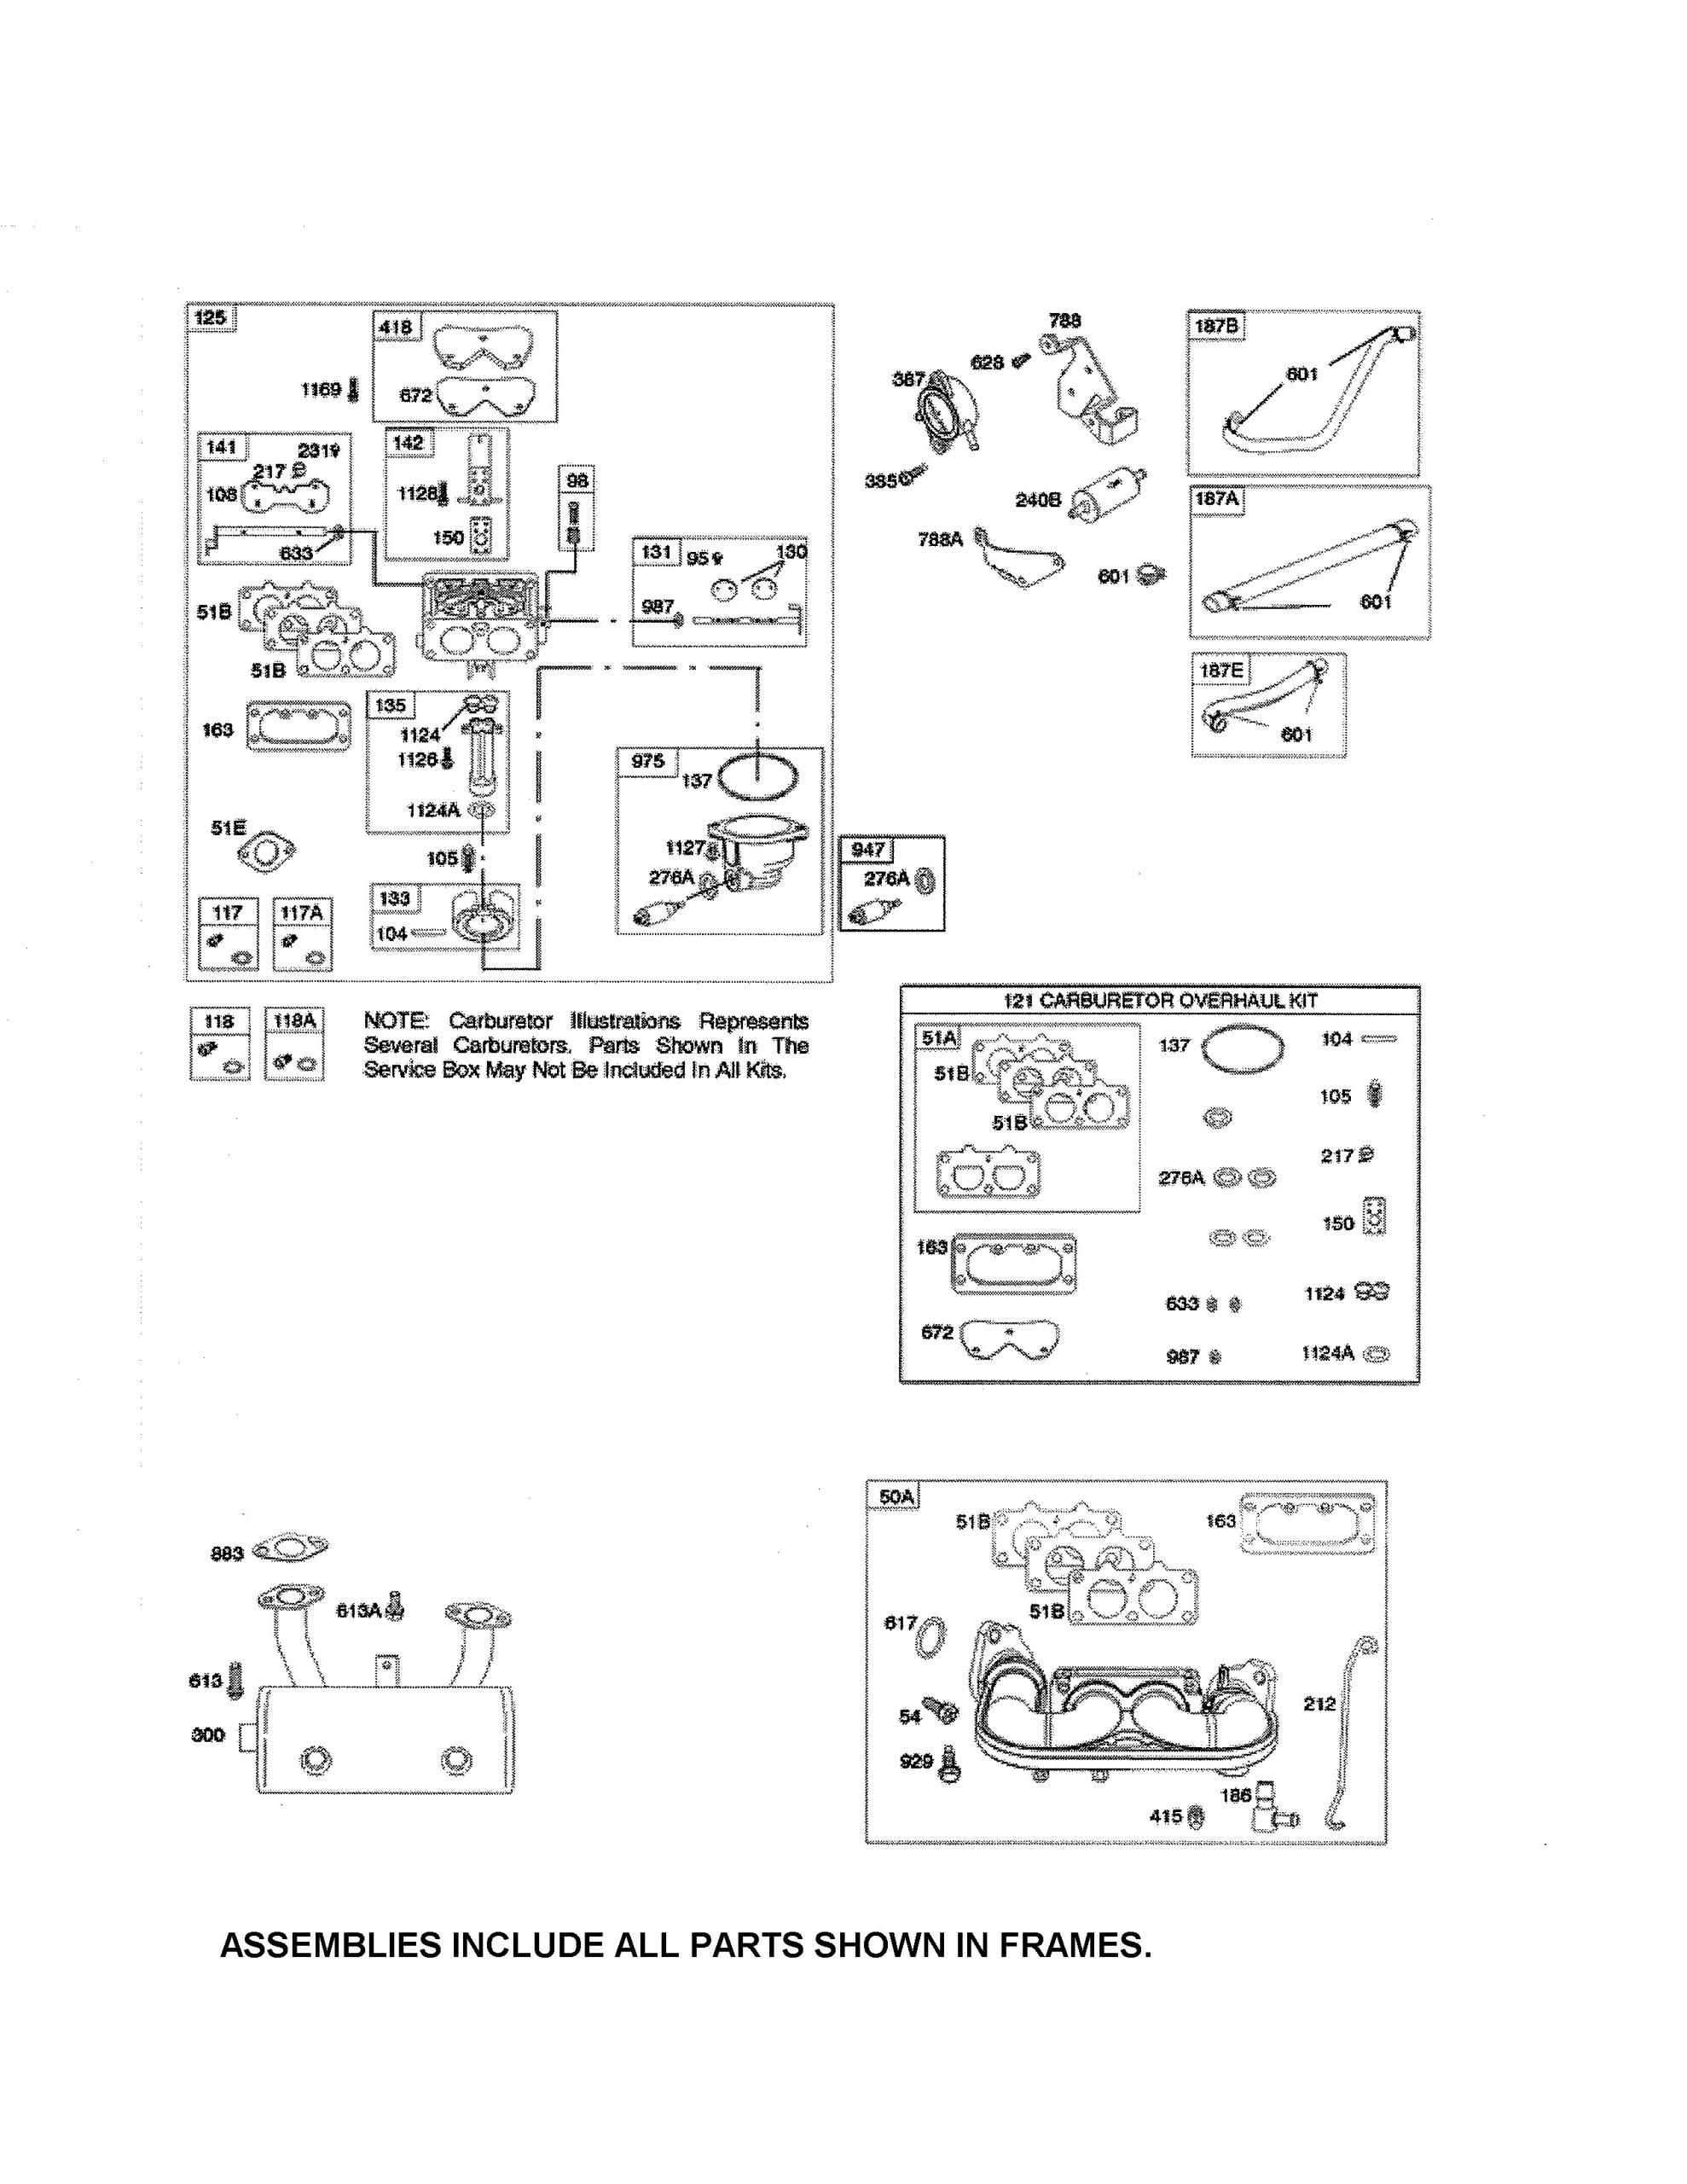 Wiring Diagram Model 44m777 B&s Briggs Stratton Model 44m777 2169 G5 Engine Genuine Parts Of Wiring Diagram Model 44m777 B&s